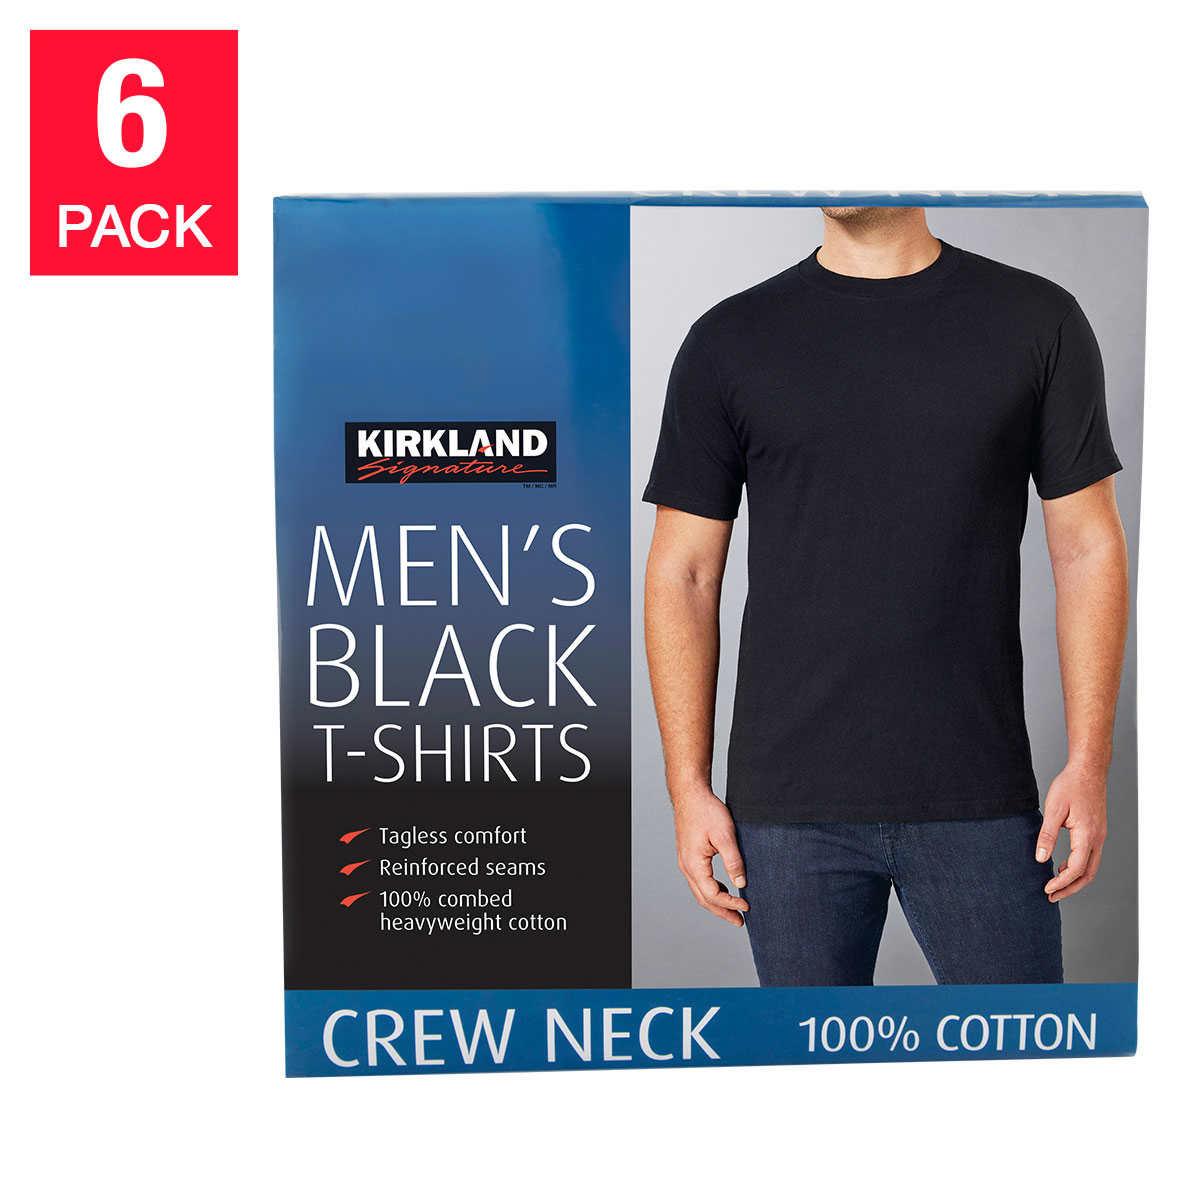 e3ba90499 Kirkland Signature Men s Crew Neck Tee